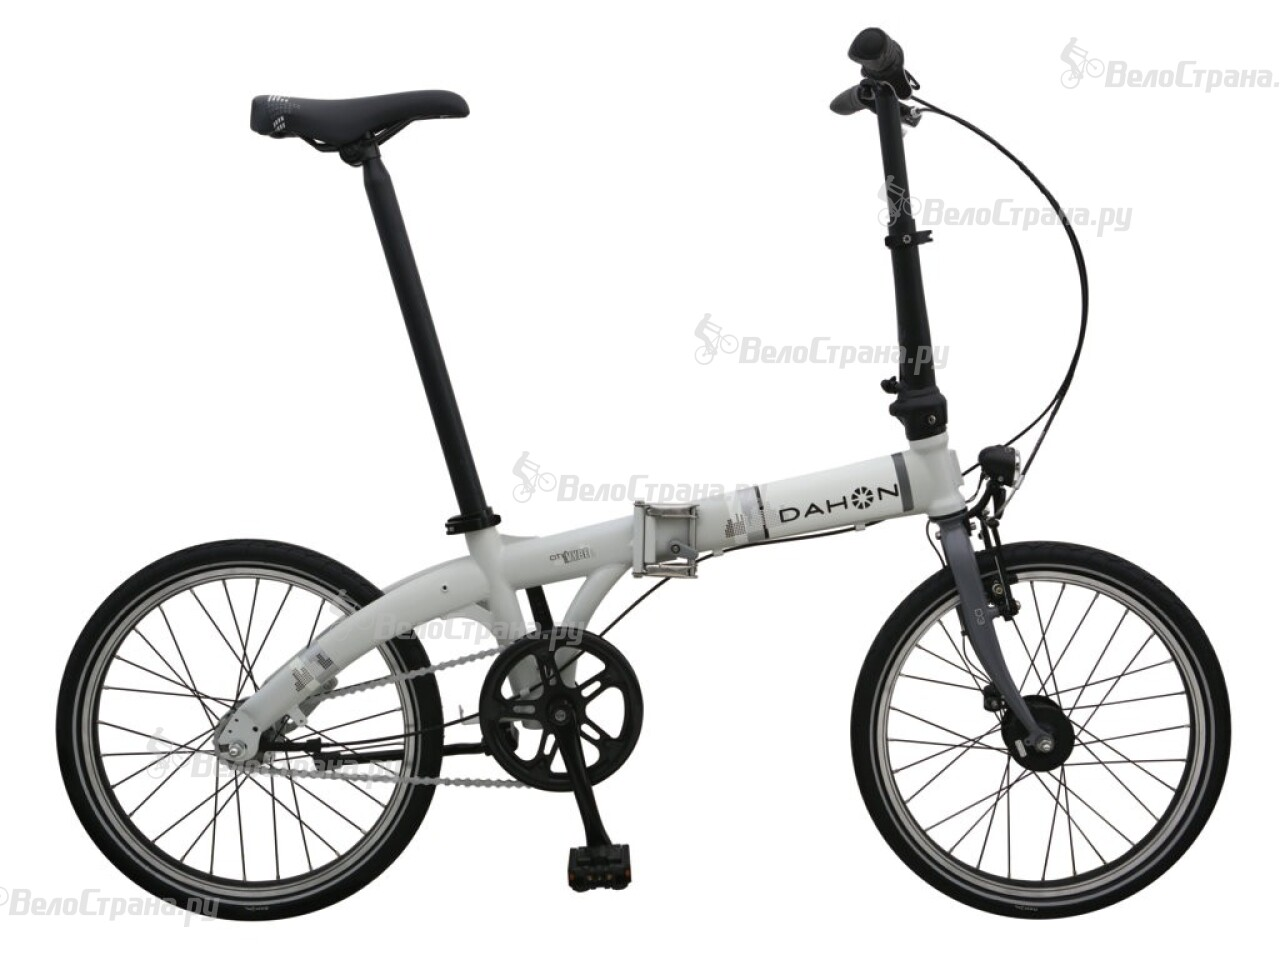 Велосипед Dahon Vybe C3 (2014) велосипед dahon vybe d7 u 2017